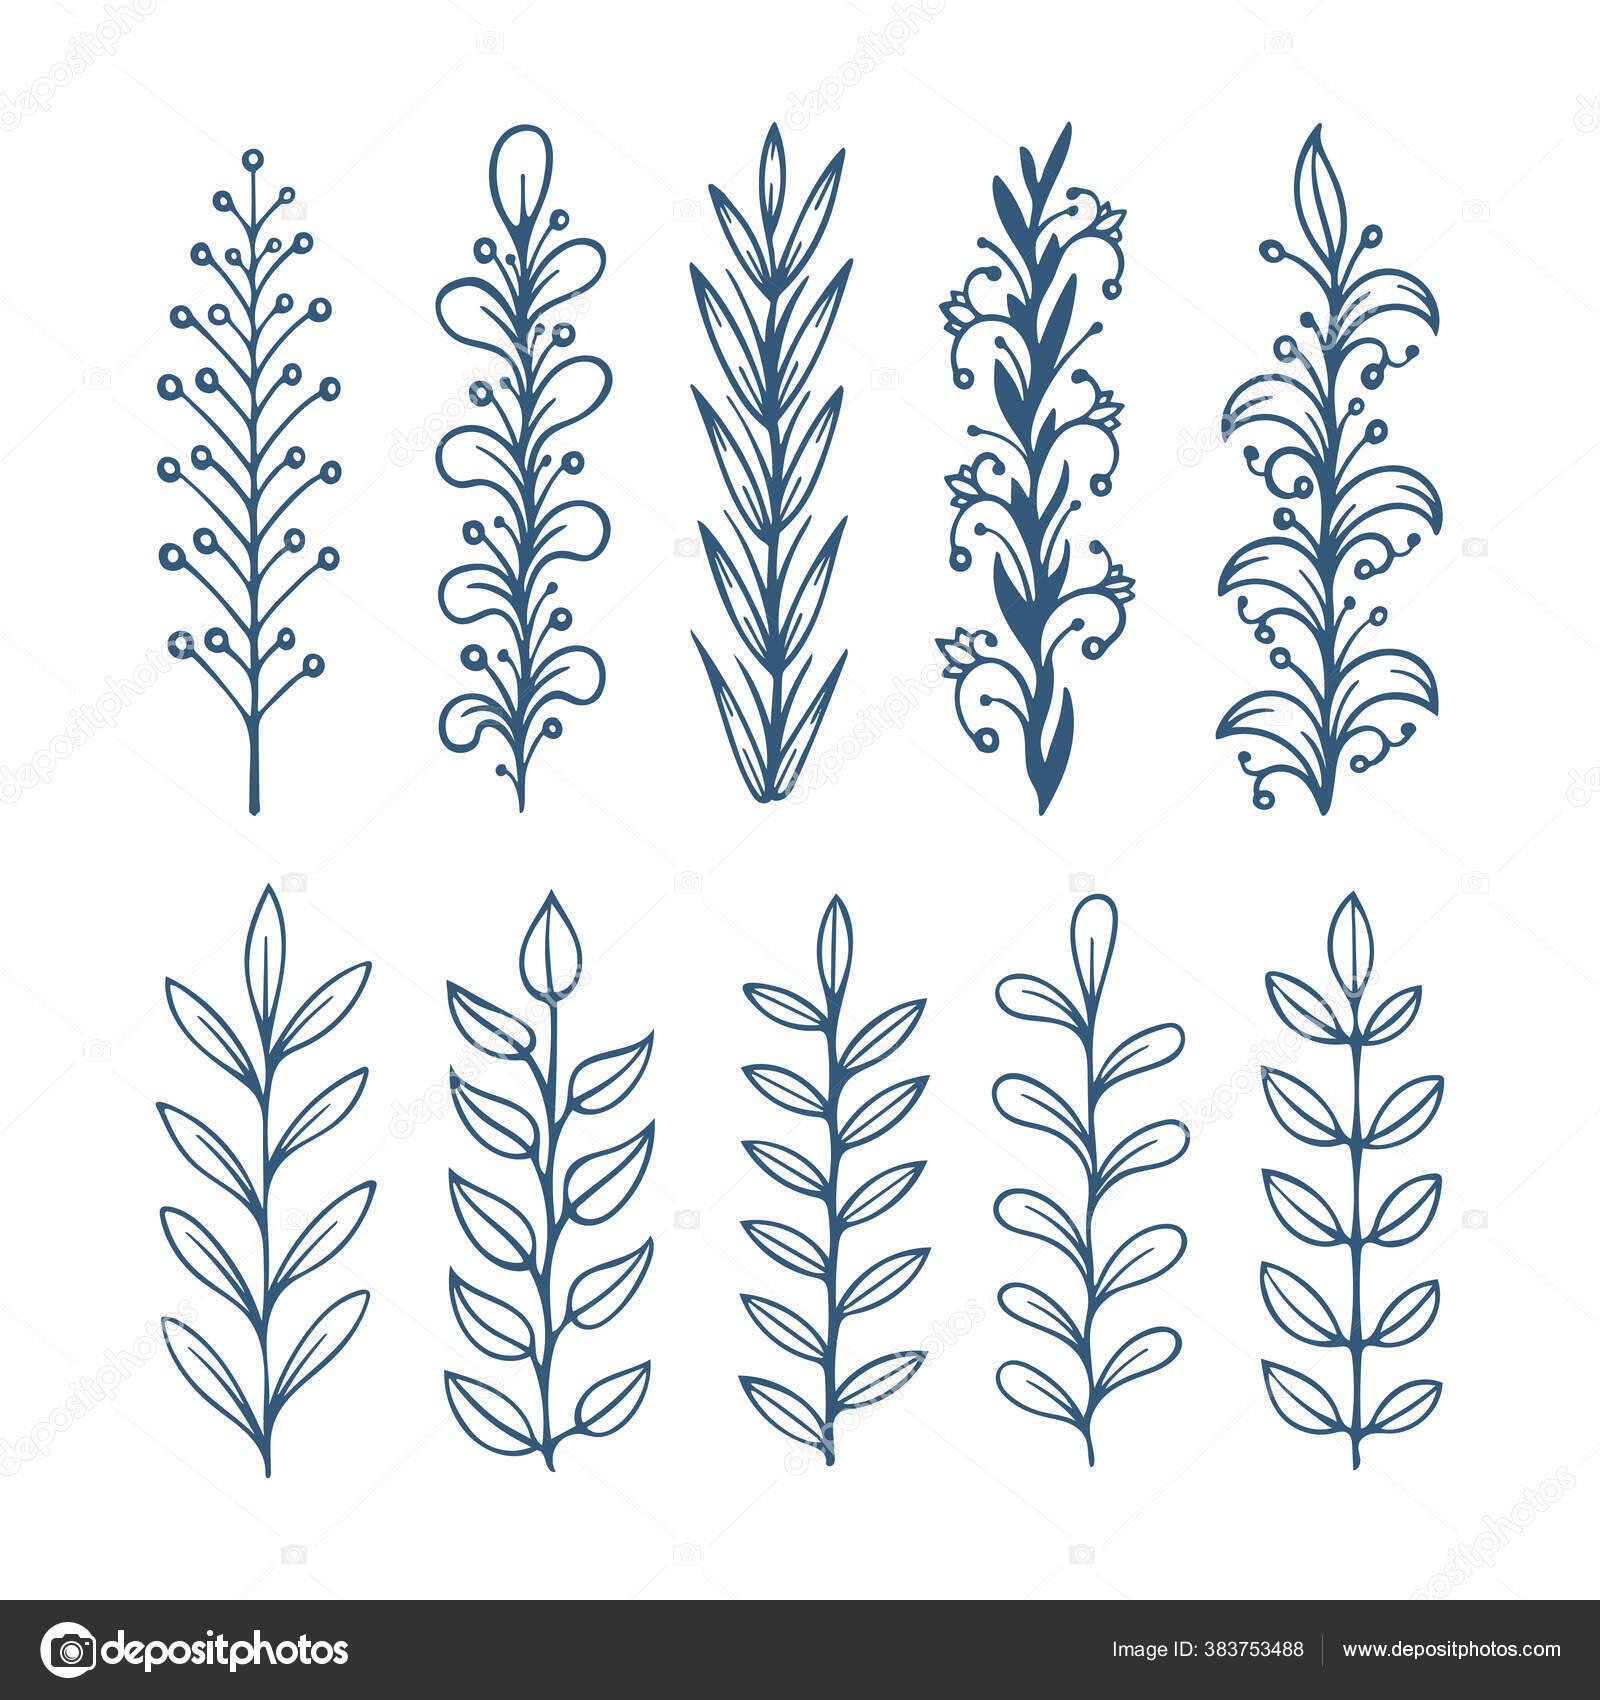 Gambar Ilustrasi Tanaman Bunga Koleksi Sketsa Bunga Tangan Digambar Bunga Sikat Gambar Sketch